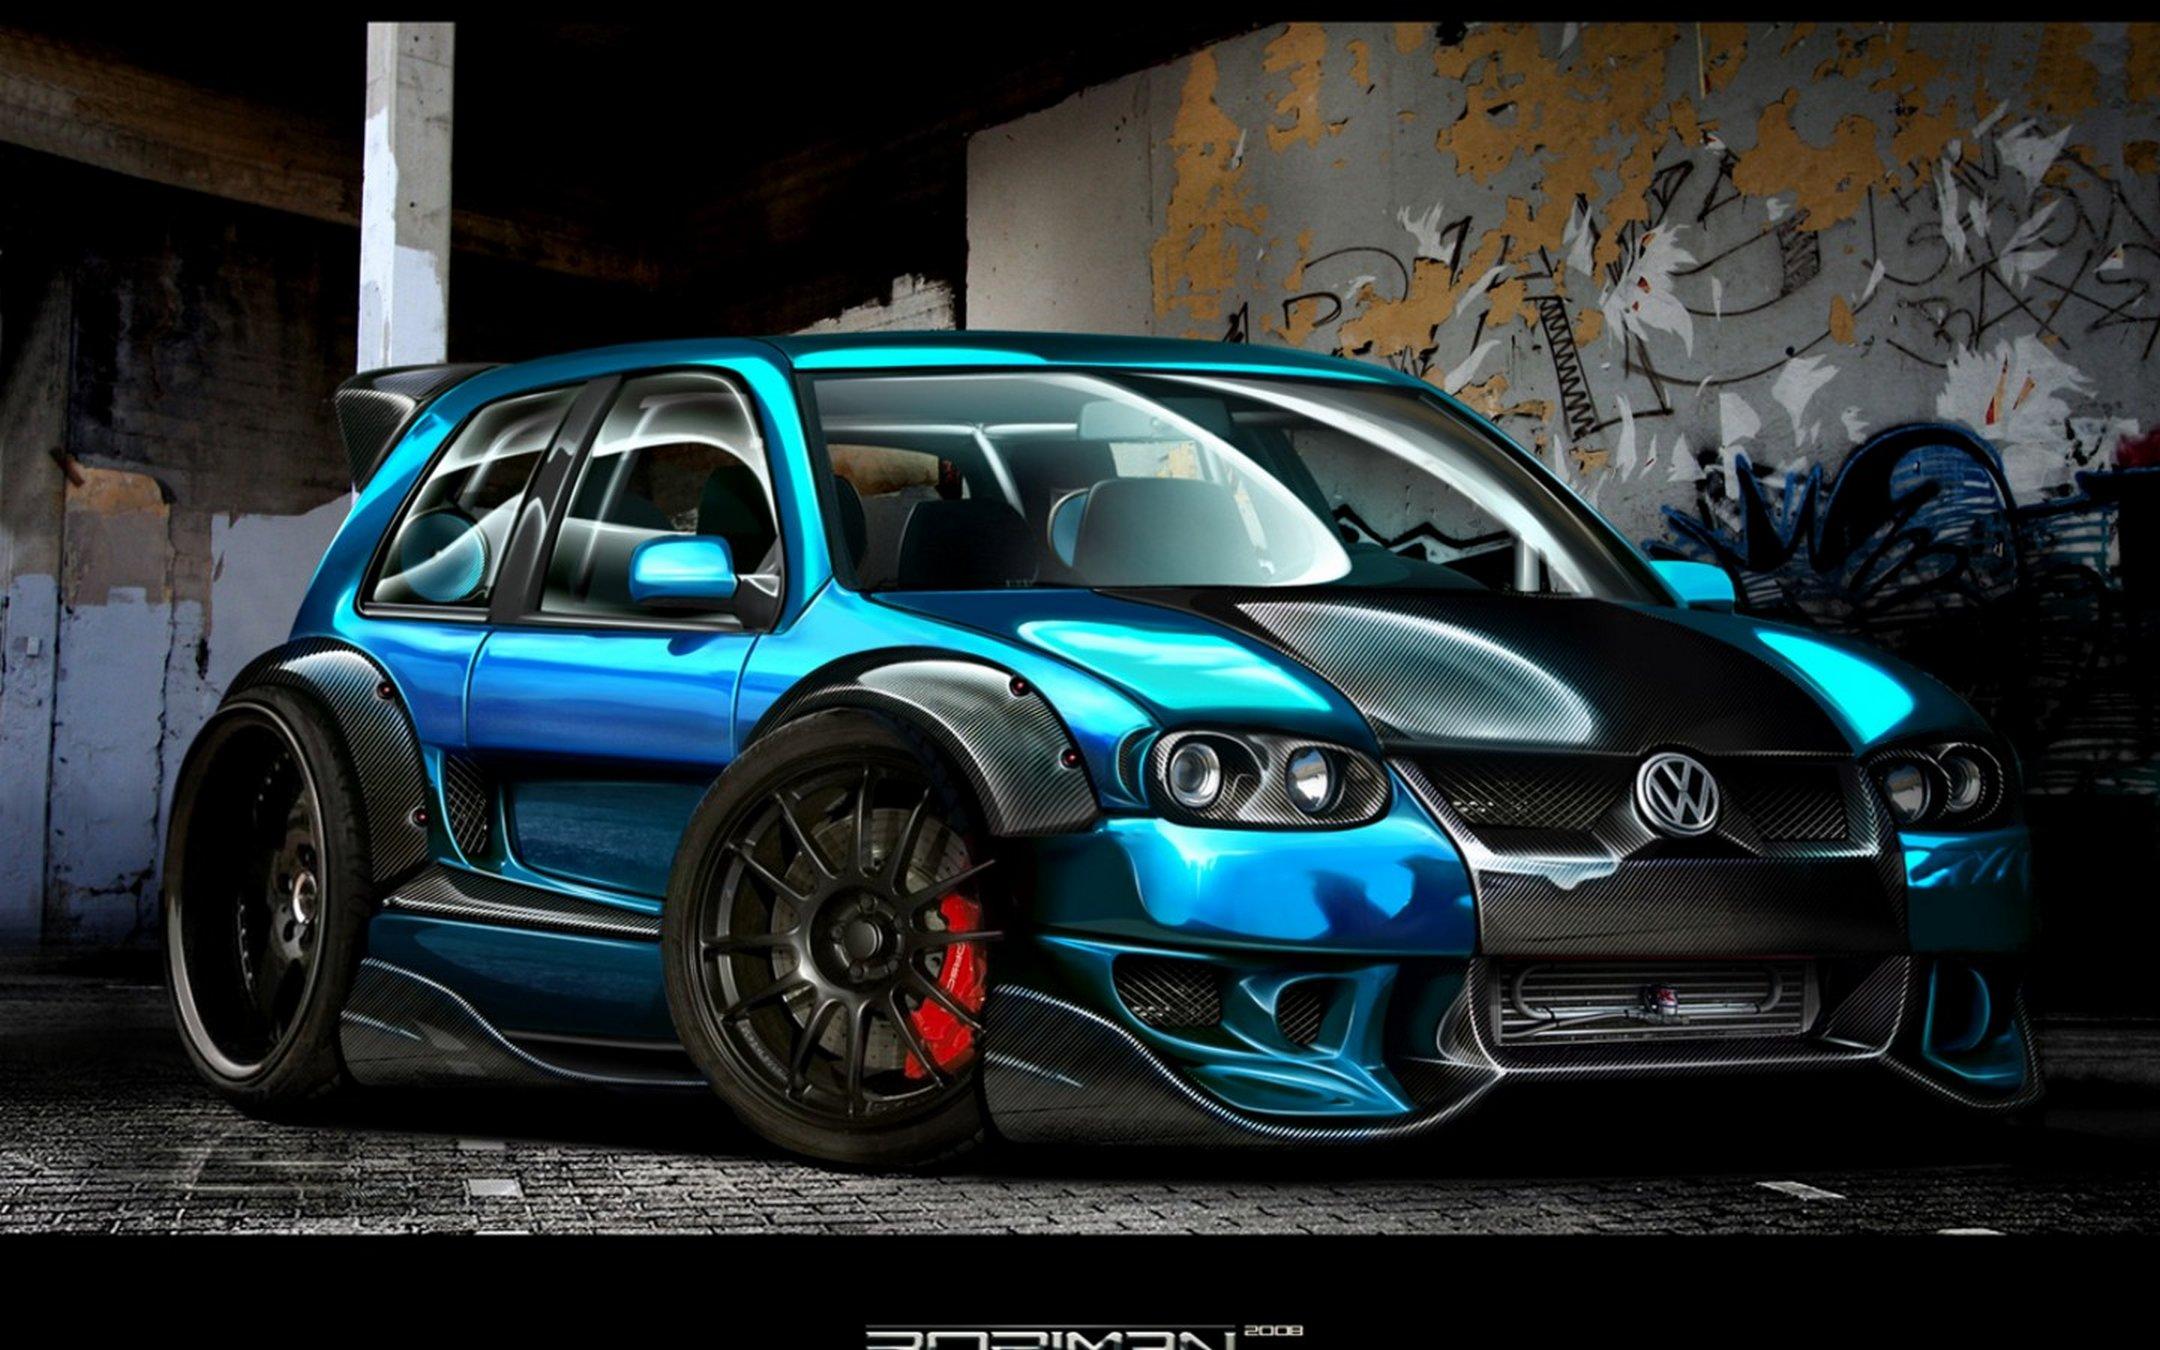 Wallpaper Desktop 3D Car High Quality Idiot Dollar 2160x1350